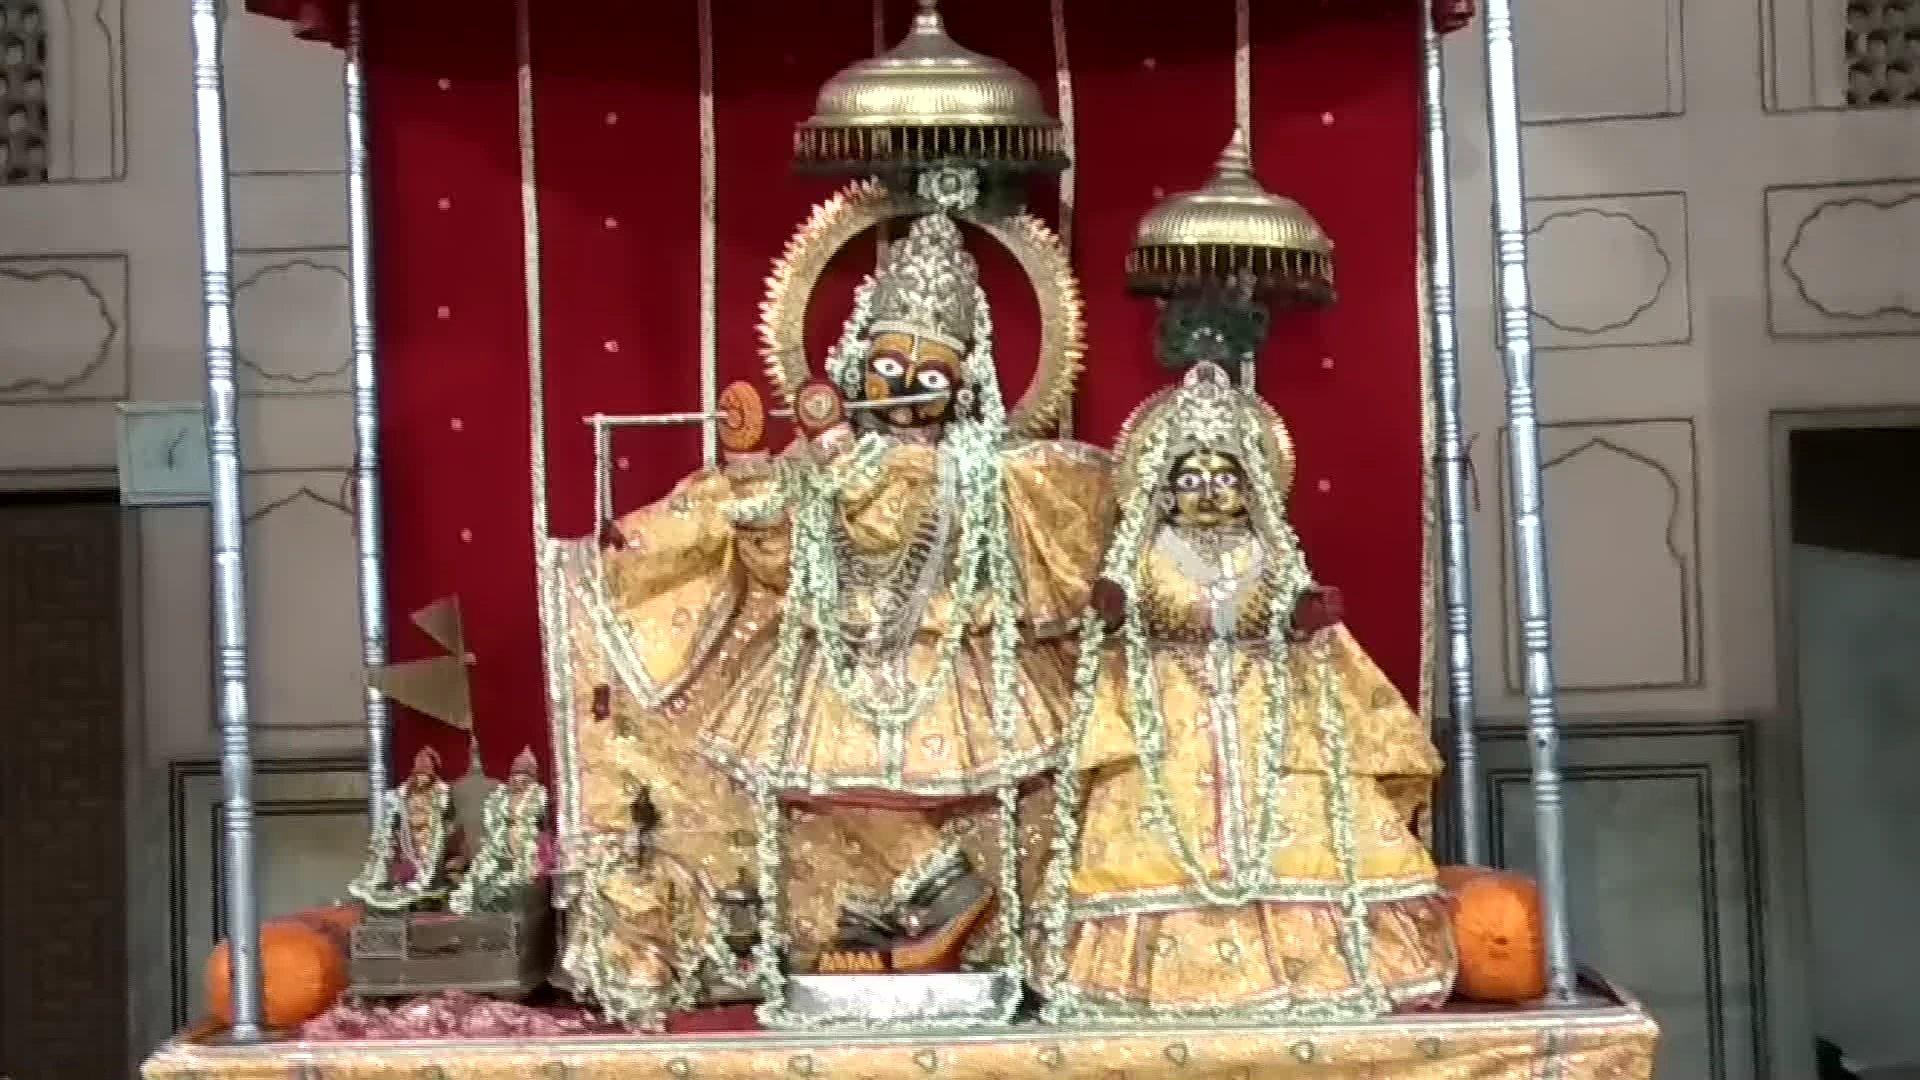 Govind Devji Mandir Me Fagotsav - गोविन्द के दरबार में मचेगी फागोत्सव की  धूम | Patrika News